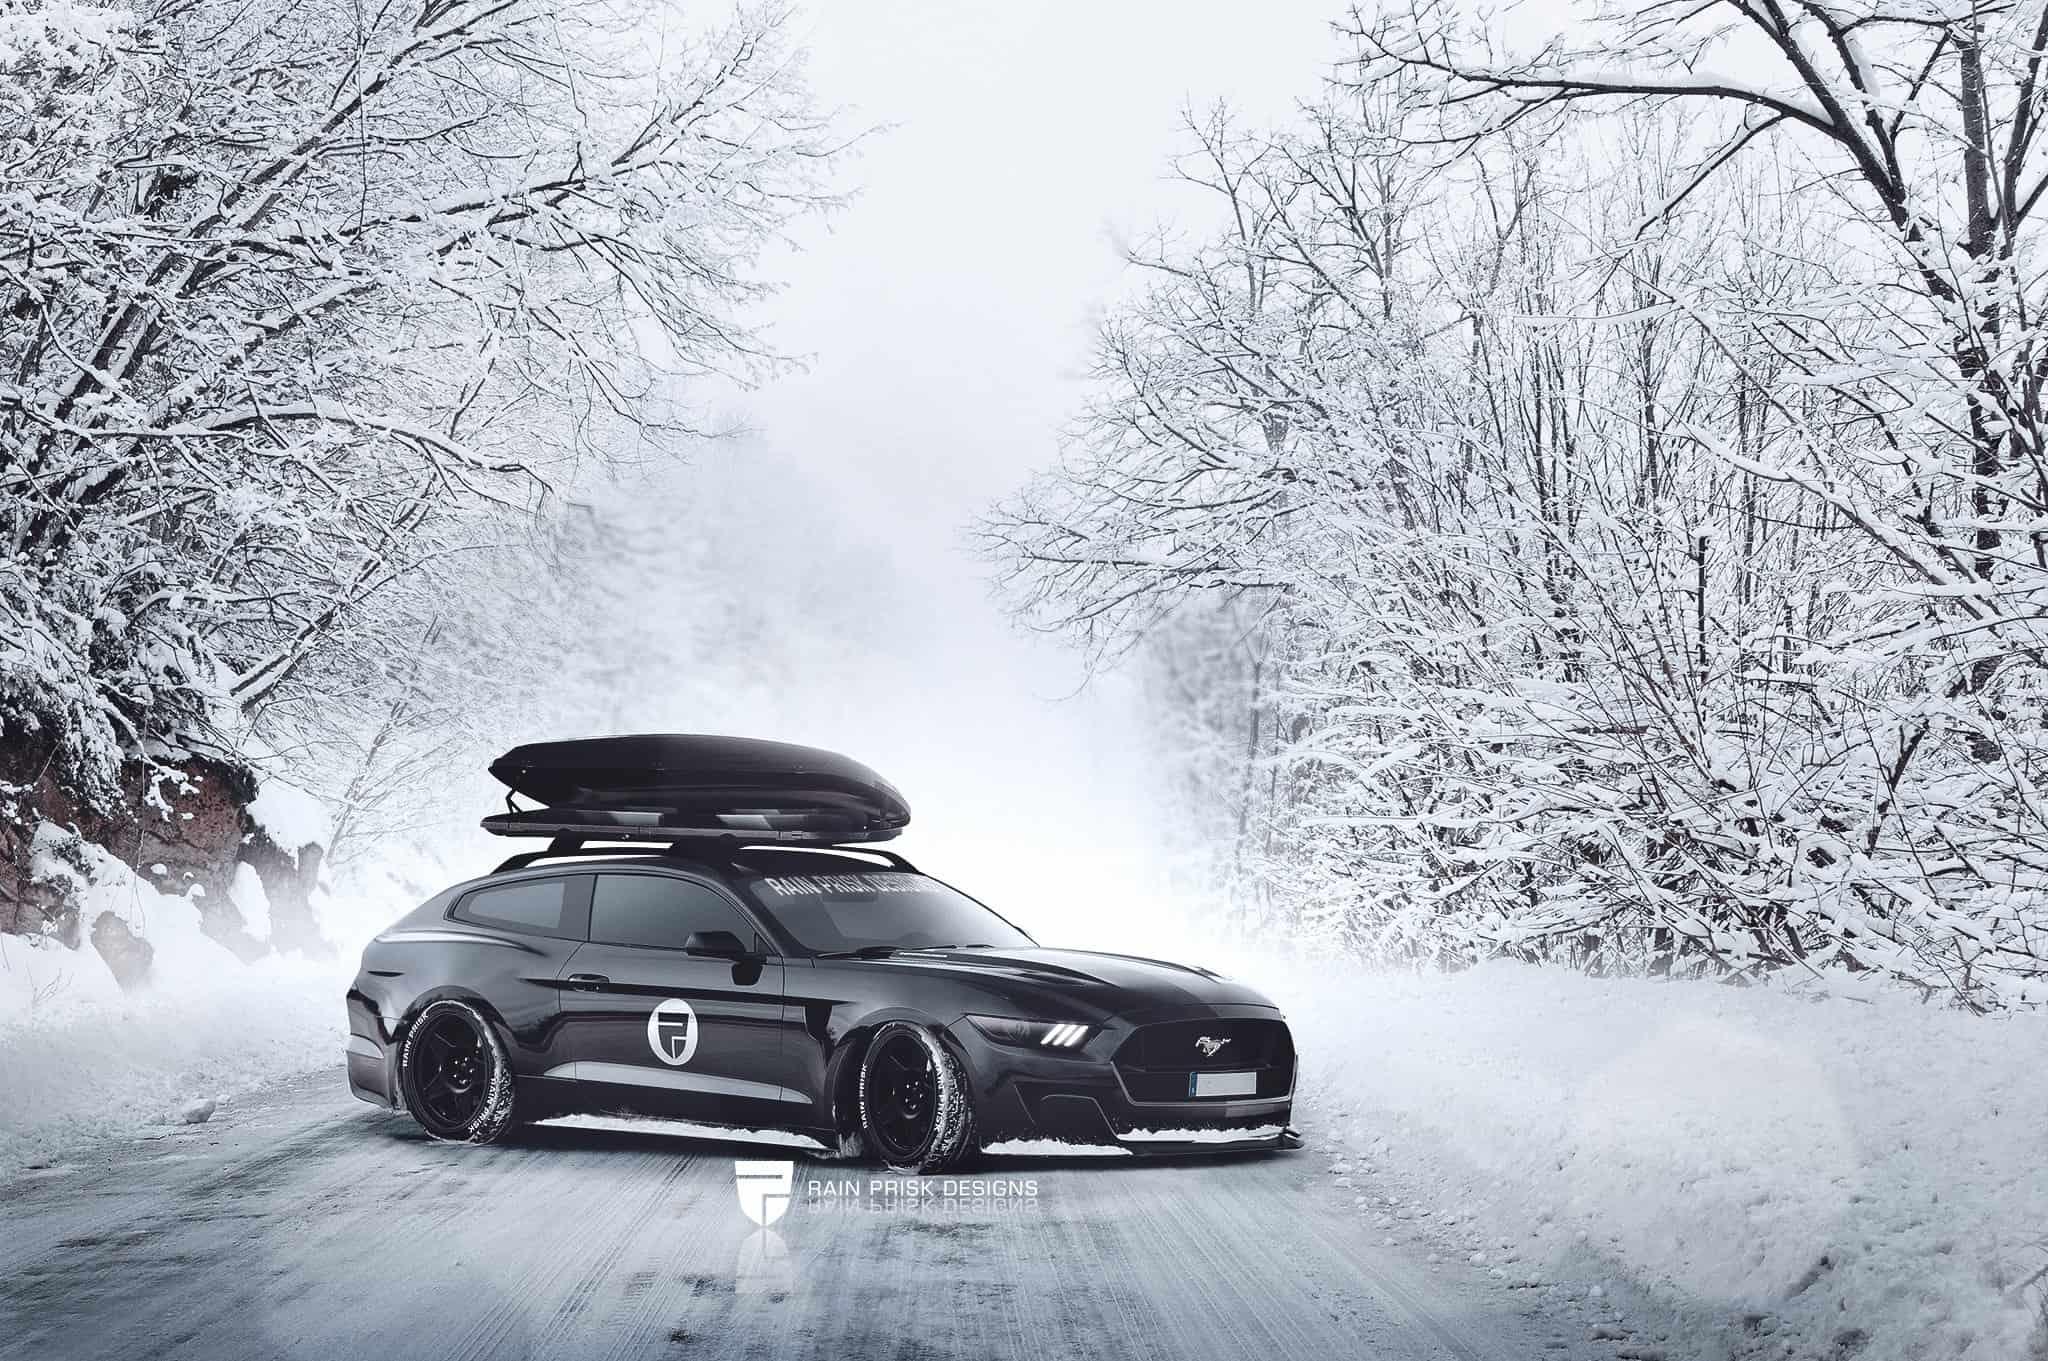 Ford Mustang 2015 ©Rain Prisk